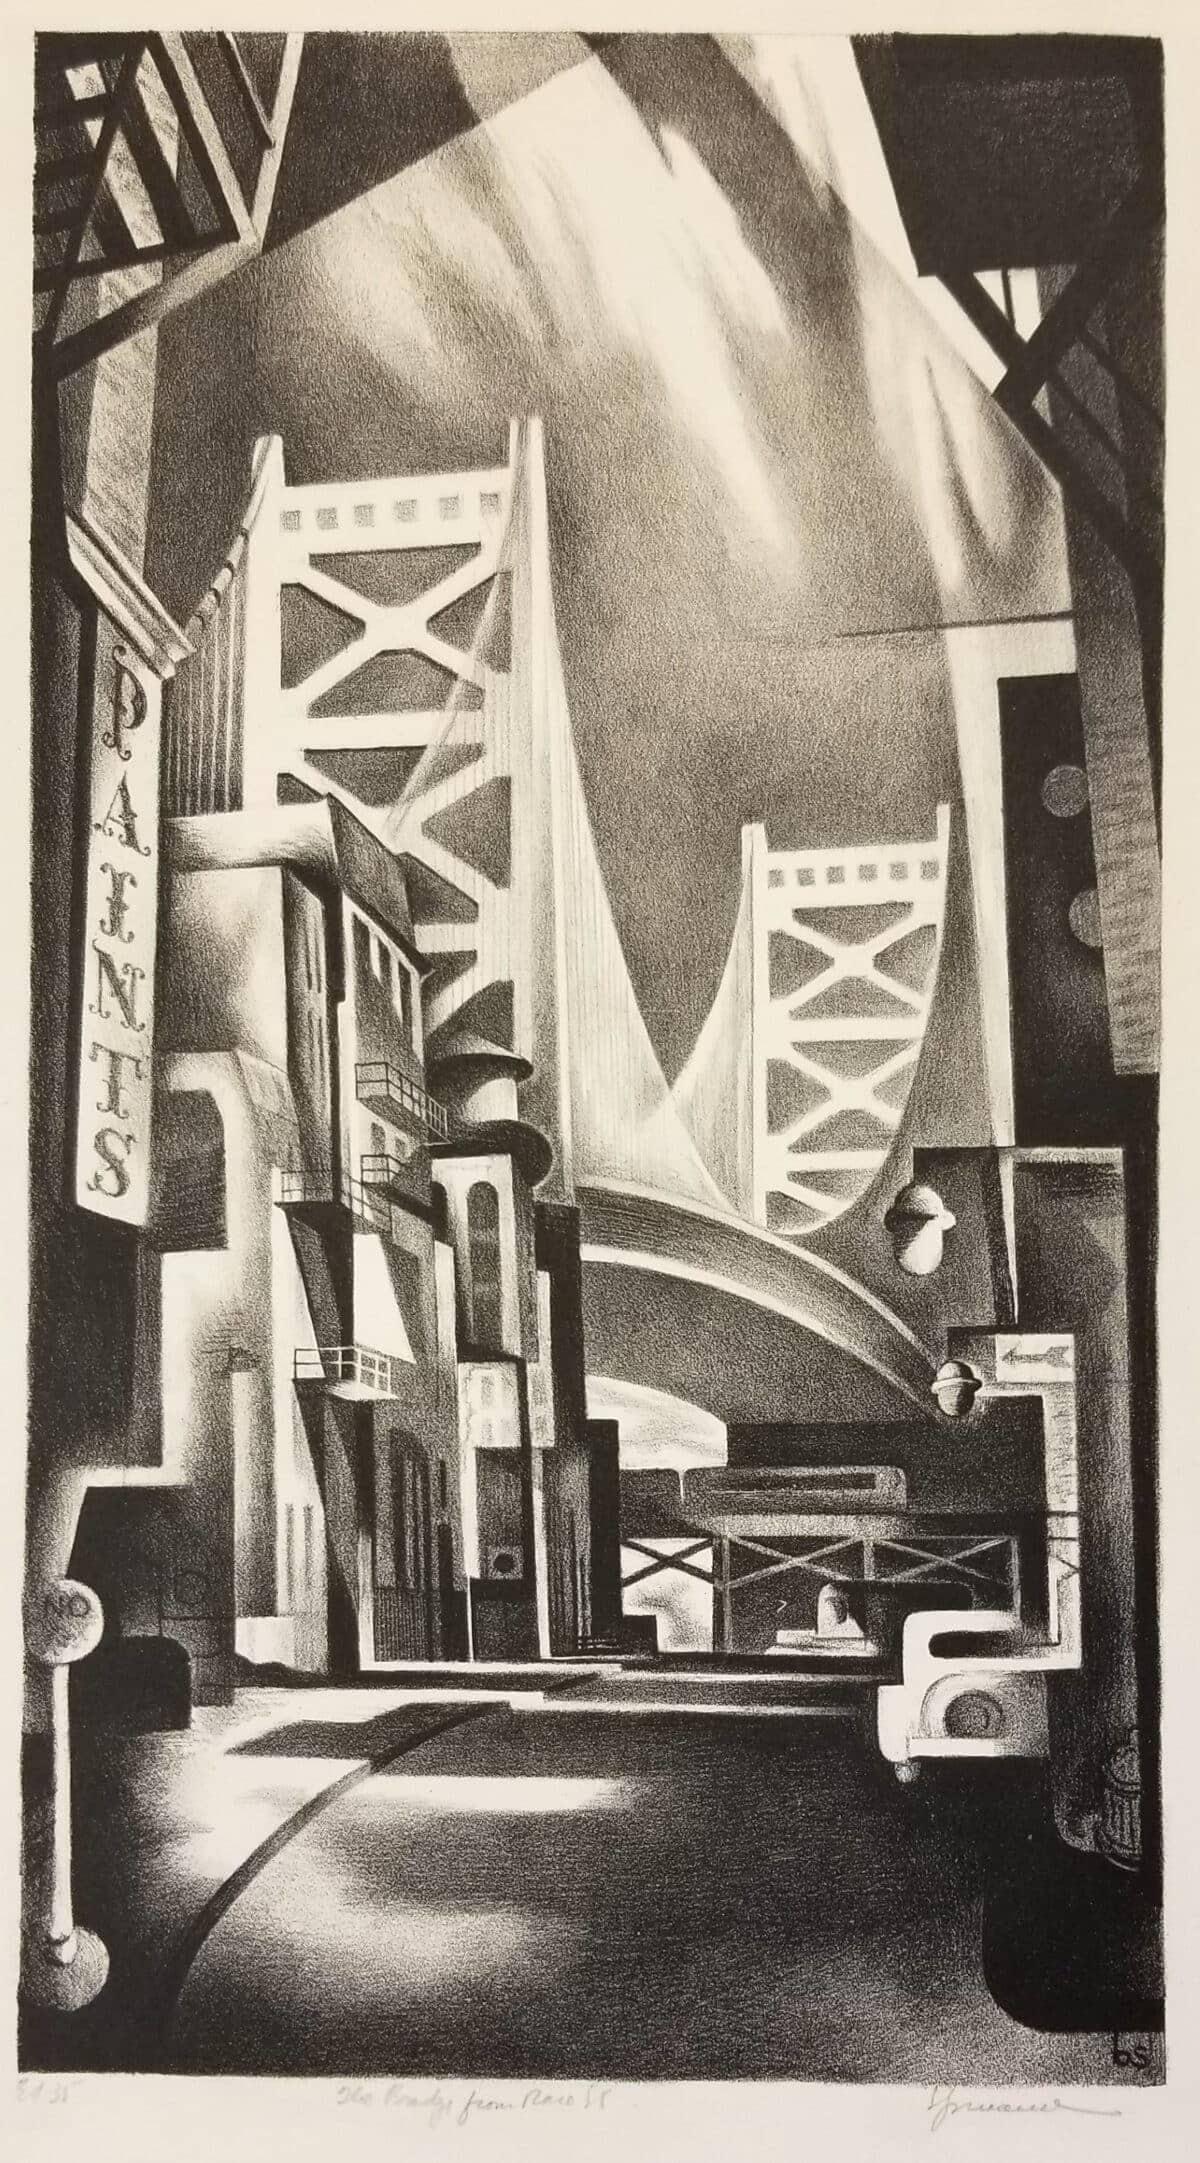 SPRUANCE_Bridge-from-race-street